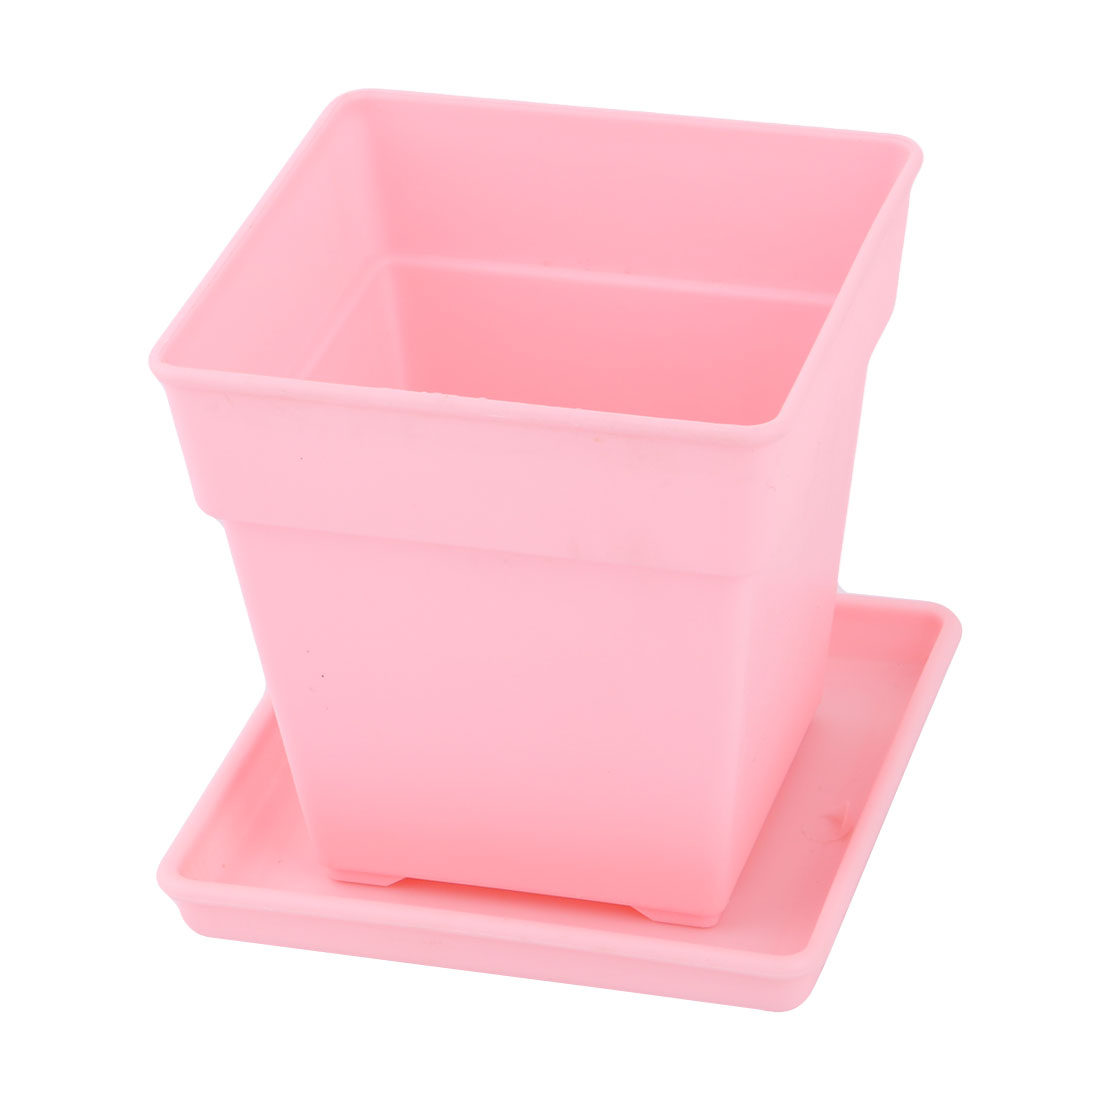 Desktop Decor Plastic Square Flower Grass Plant Pot Tray Holder Container Pink